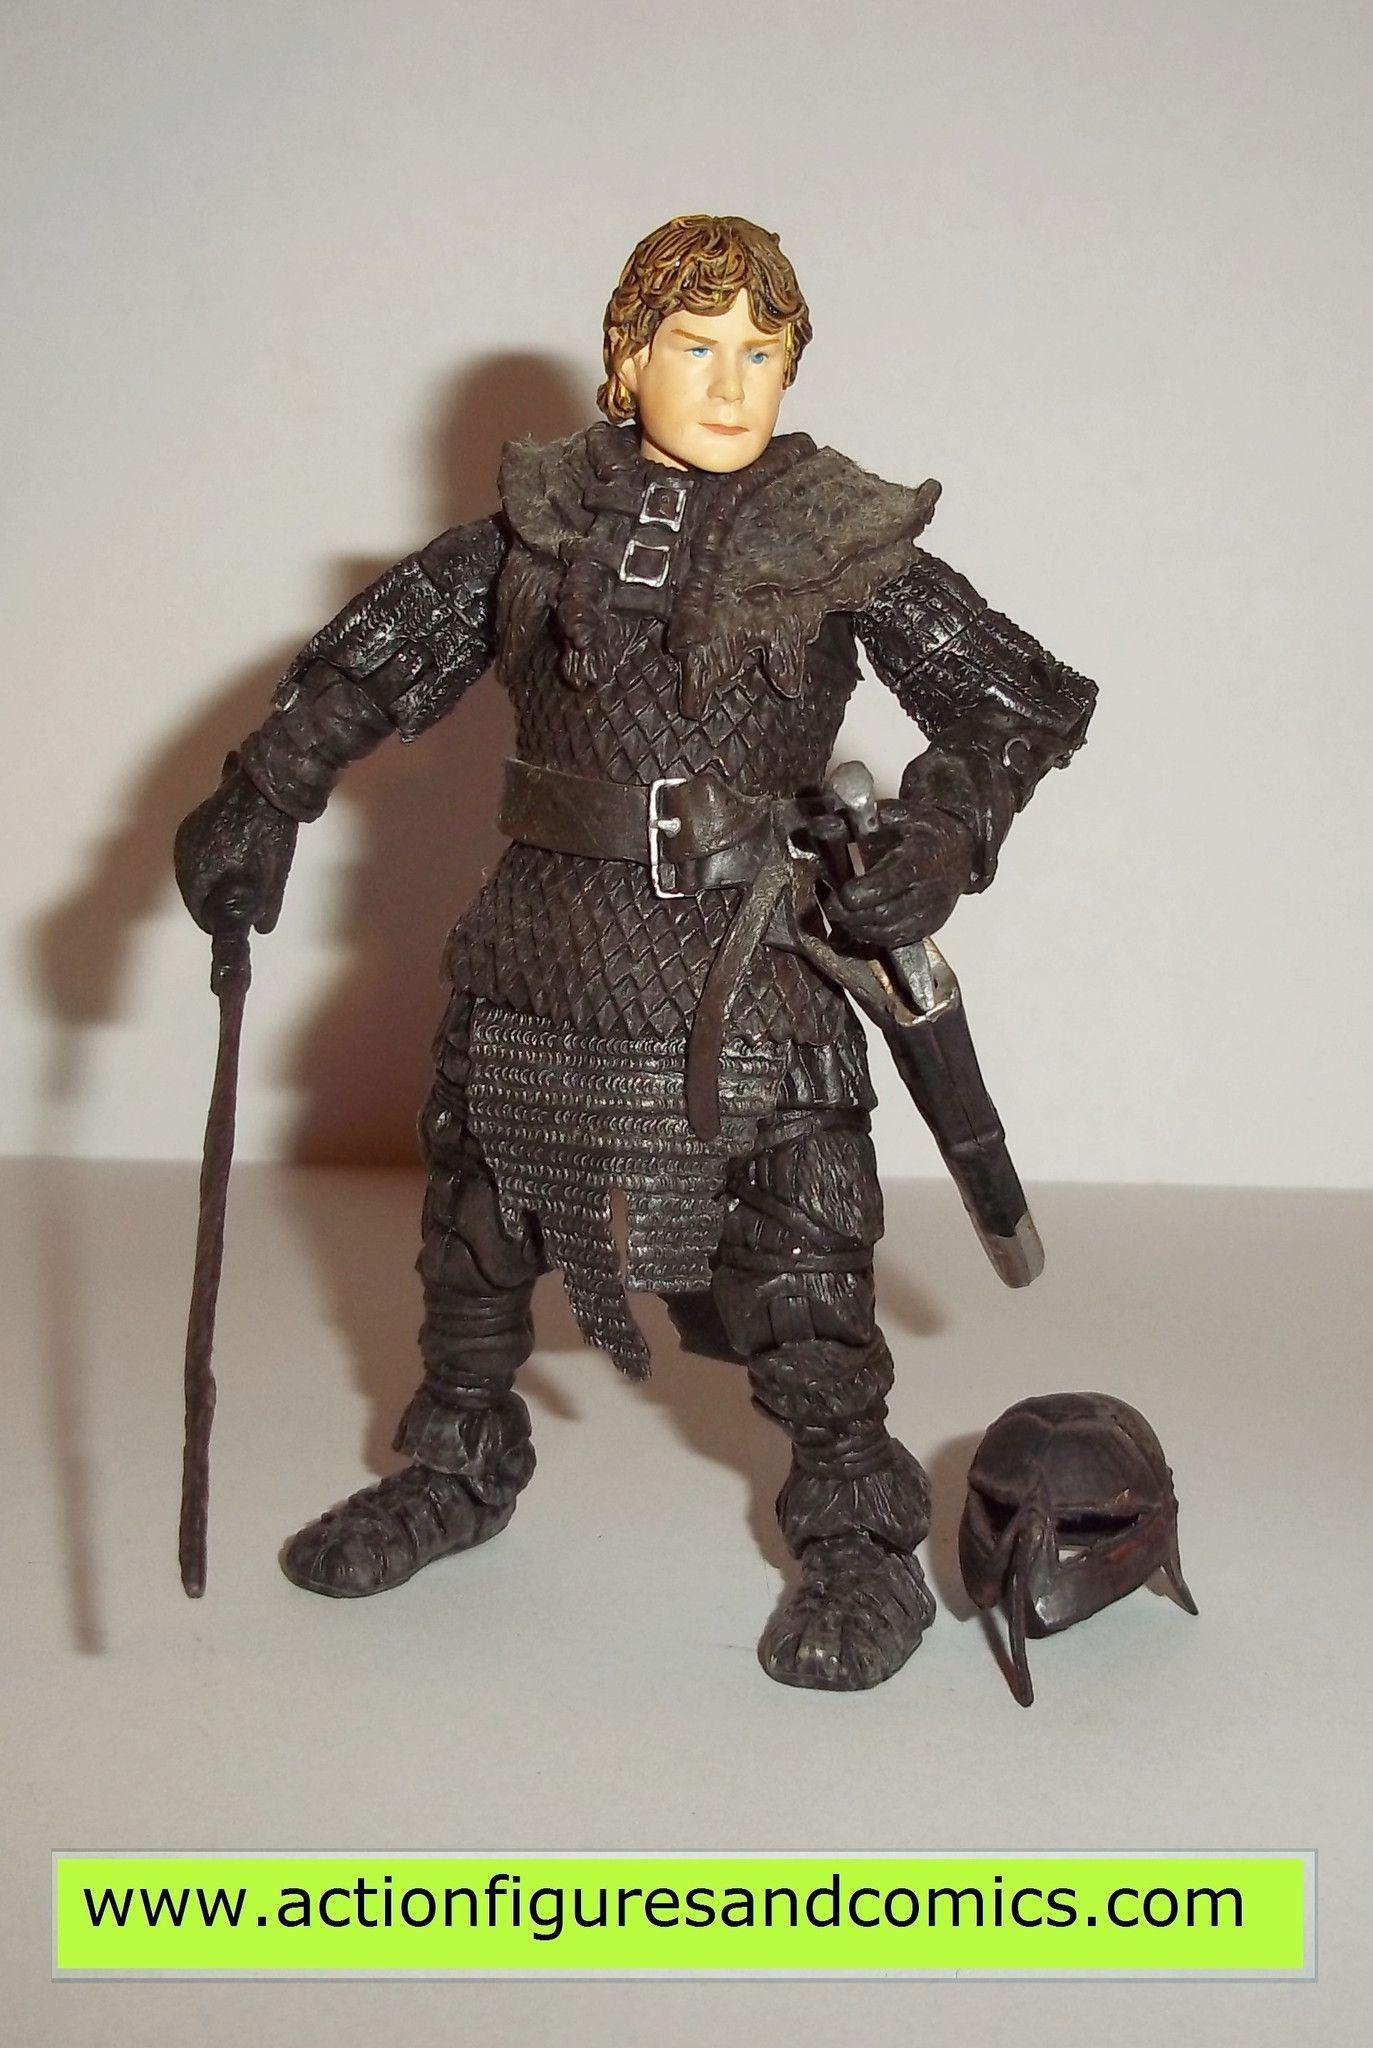 Lord Of The Rings Samwise Gamgee Goblin Armor Toy Biz Complete Hobbit Samwise Gamgee The Hobbit Goblin